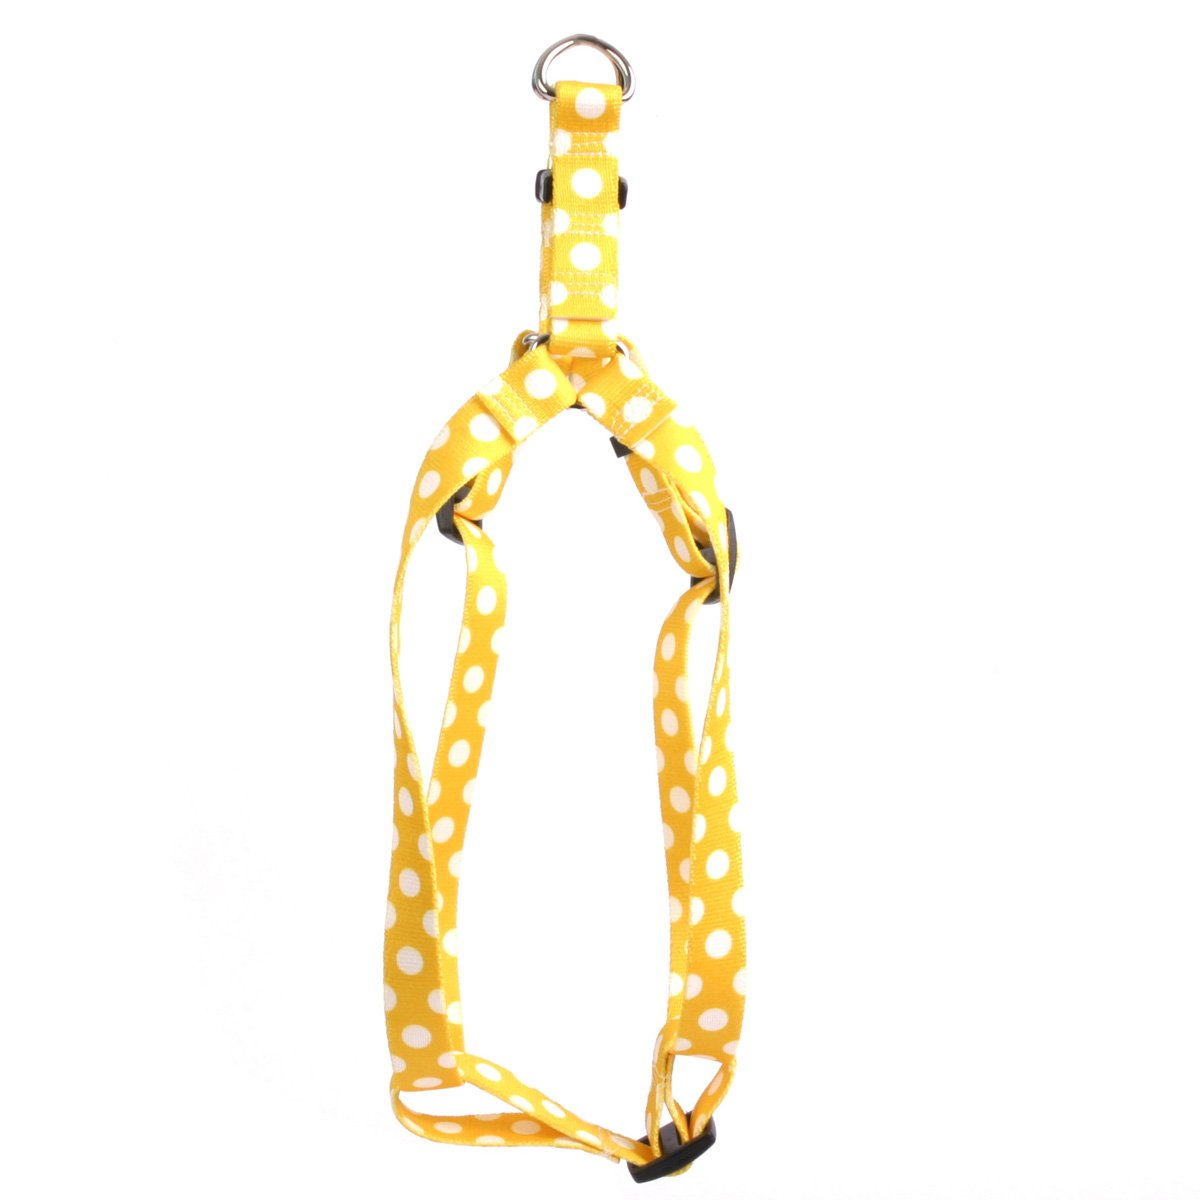 Lemon Polka Dot Large 25\ Lemon Polka Dot Large 25\ Yellow Dog Design Lemon Polka Dots 25-Feet to 40-Feet Step-in Harness, Large